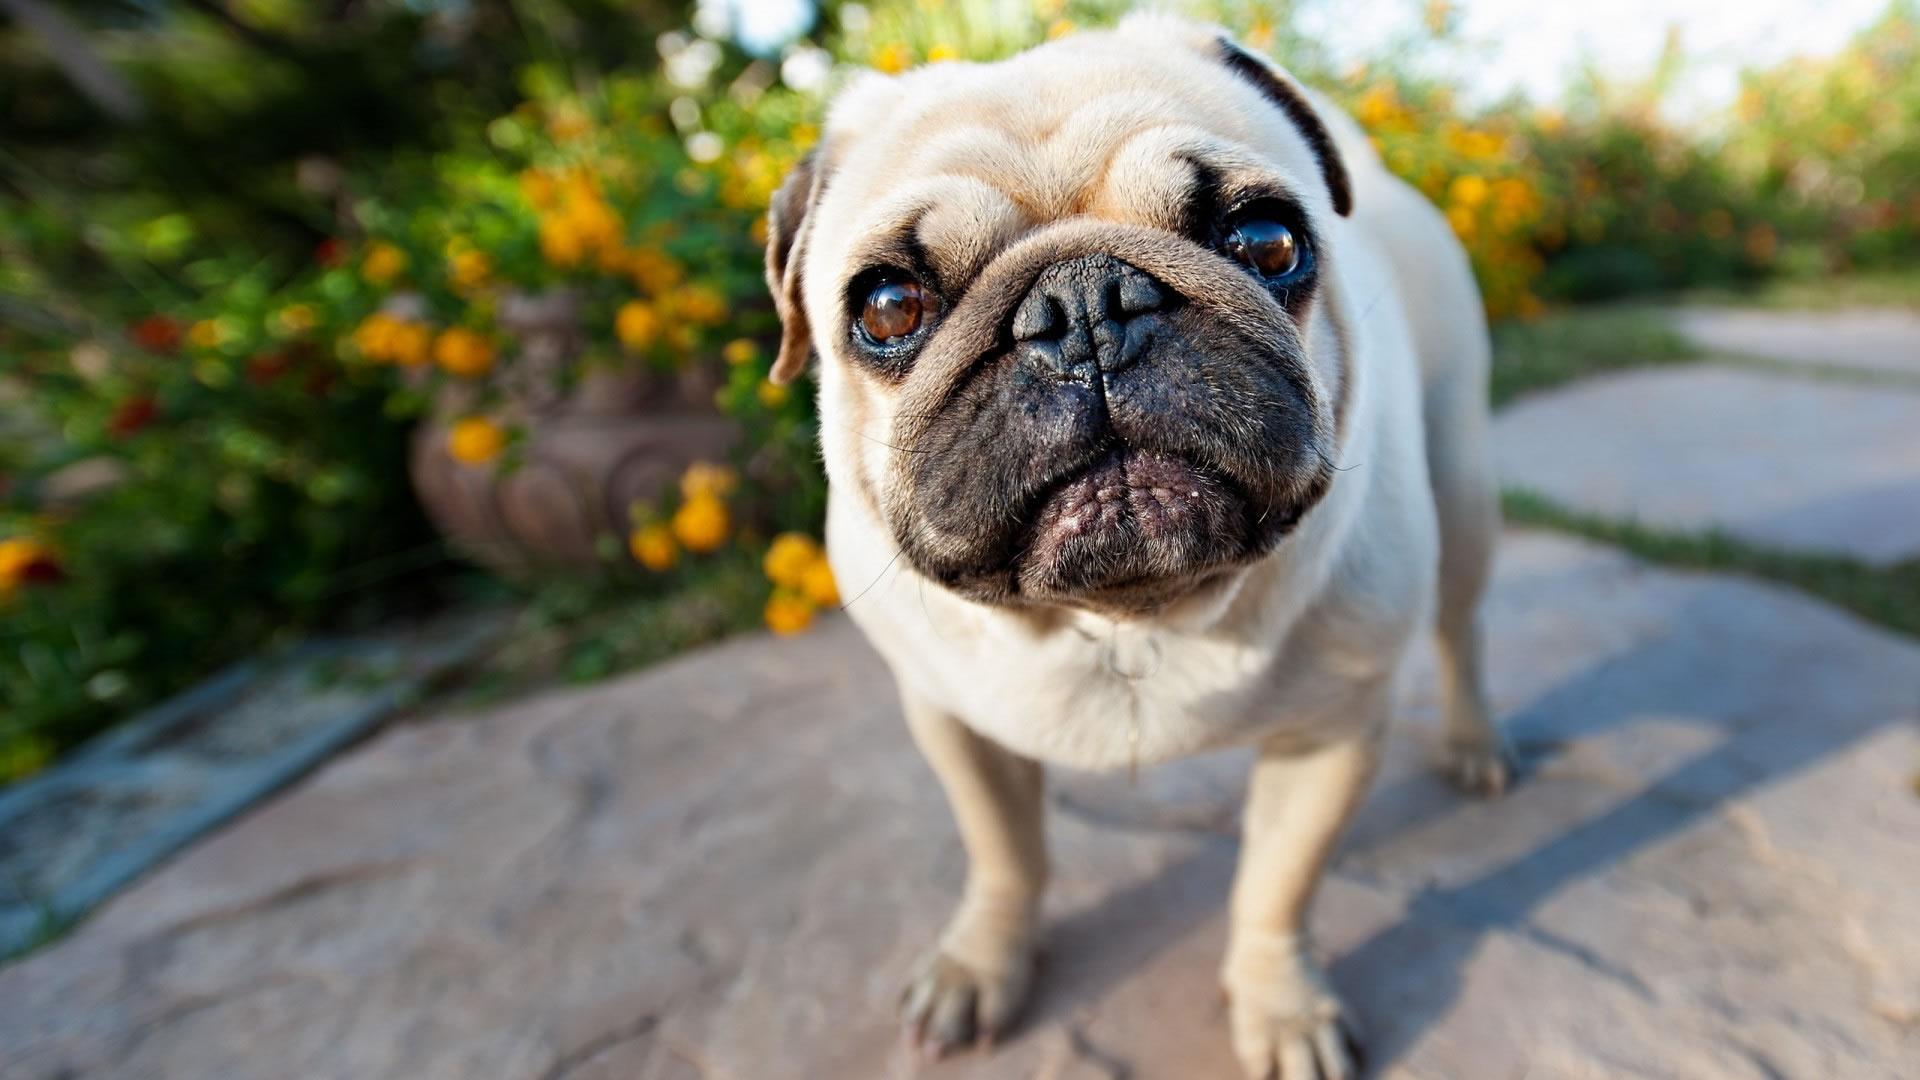 pug dog wallpaper - my doggy rocks